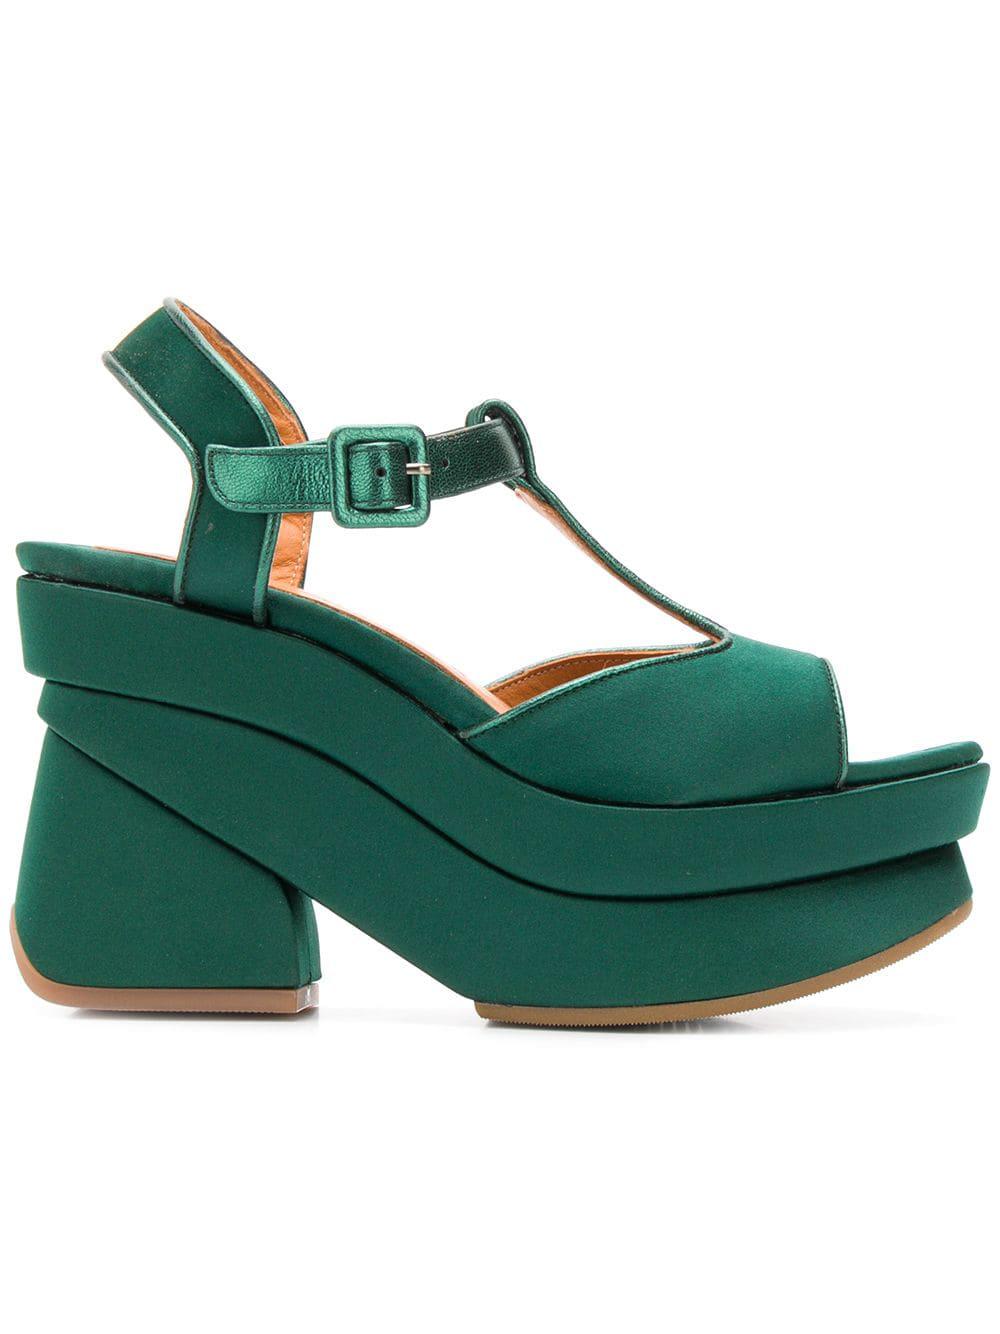 264fdae42f1 Chie Mihara Vreni Platform Sandals - Green. Farfetch